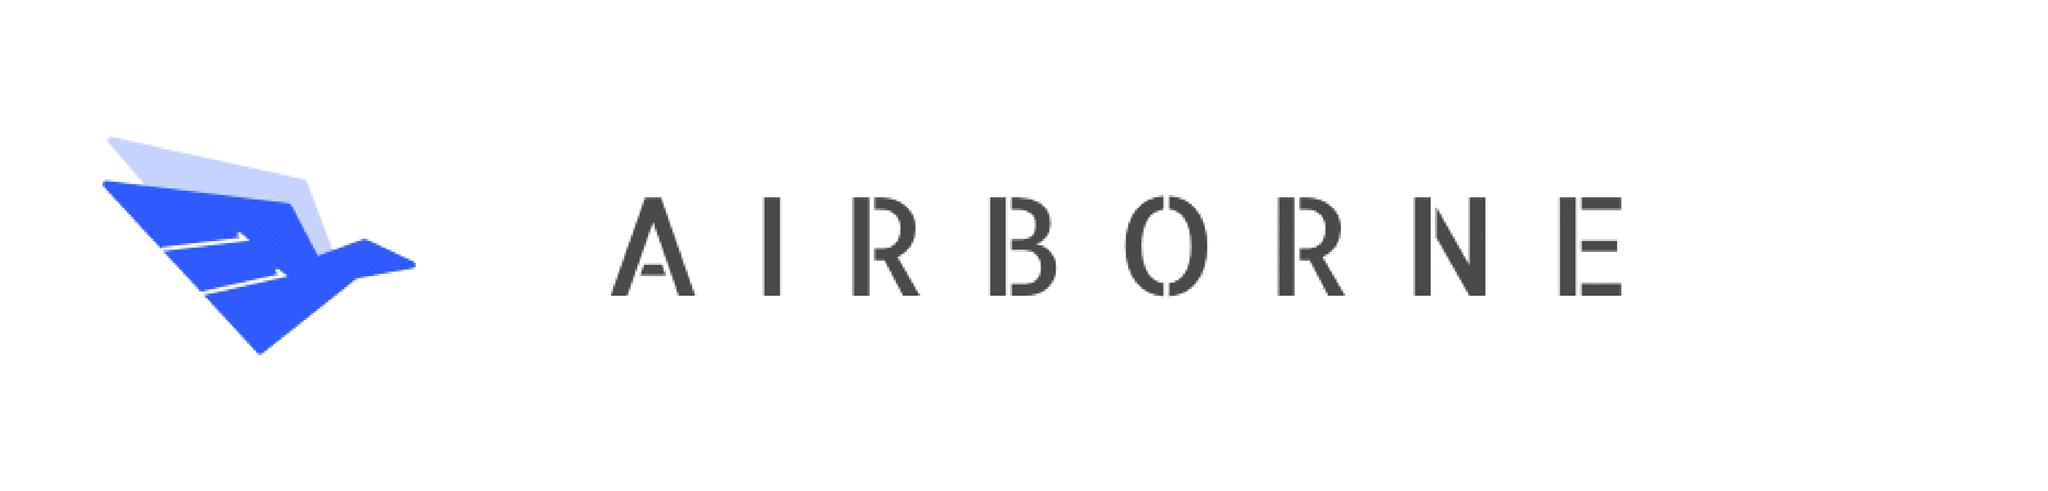 Airborne App brand logo